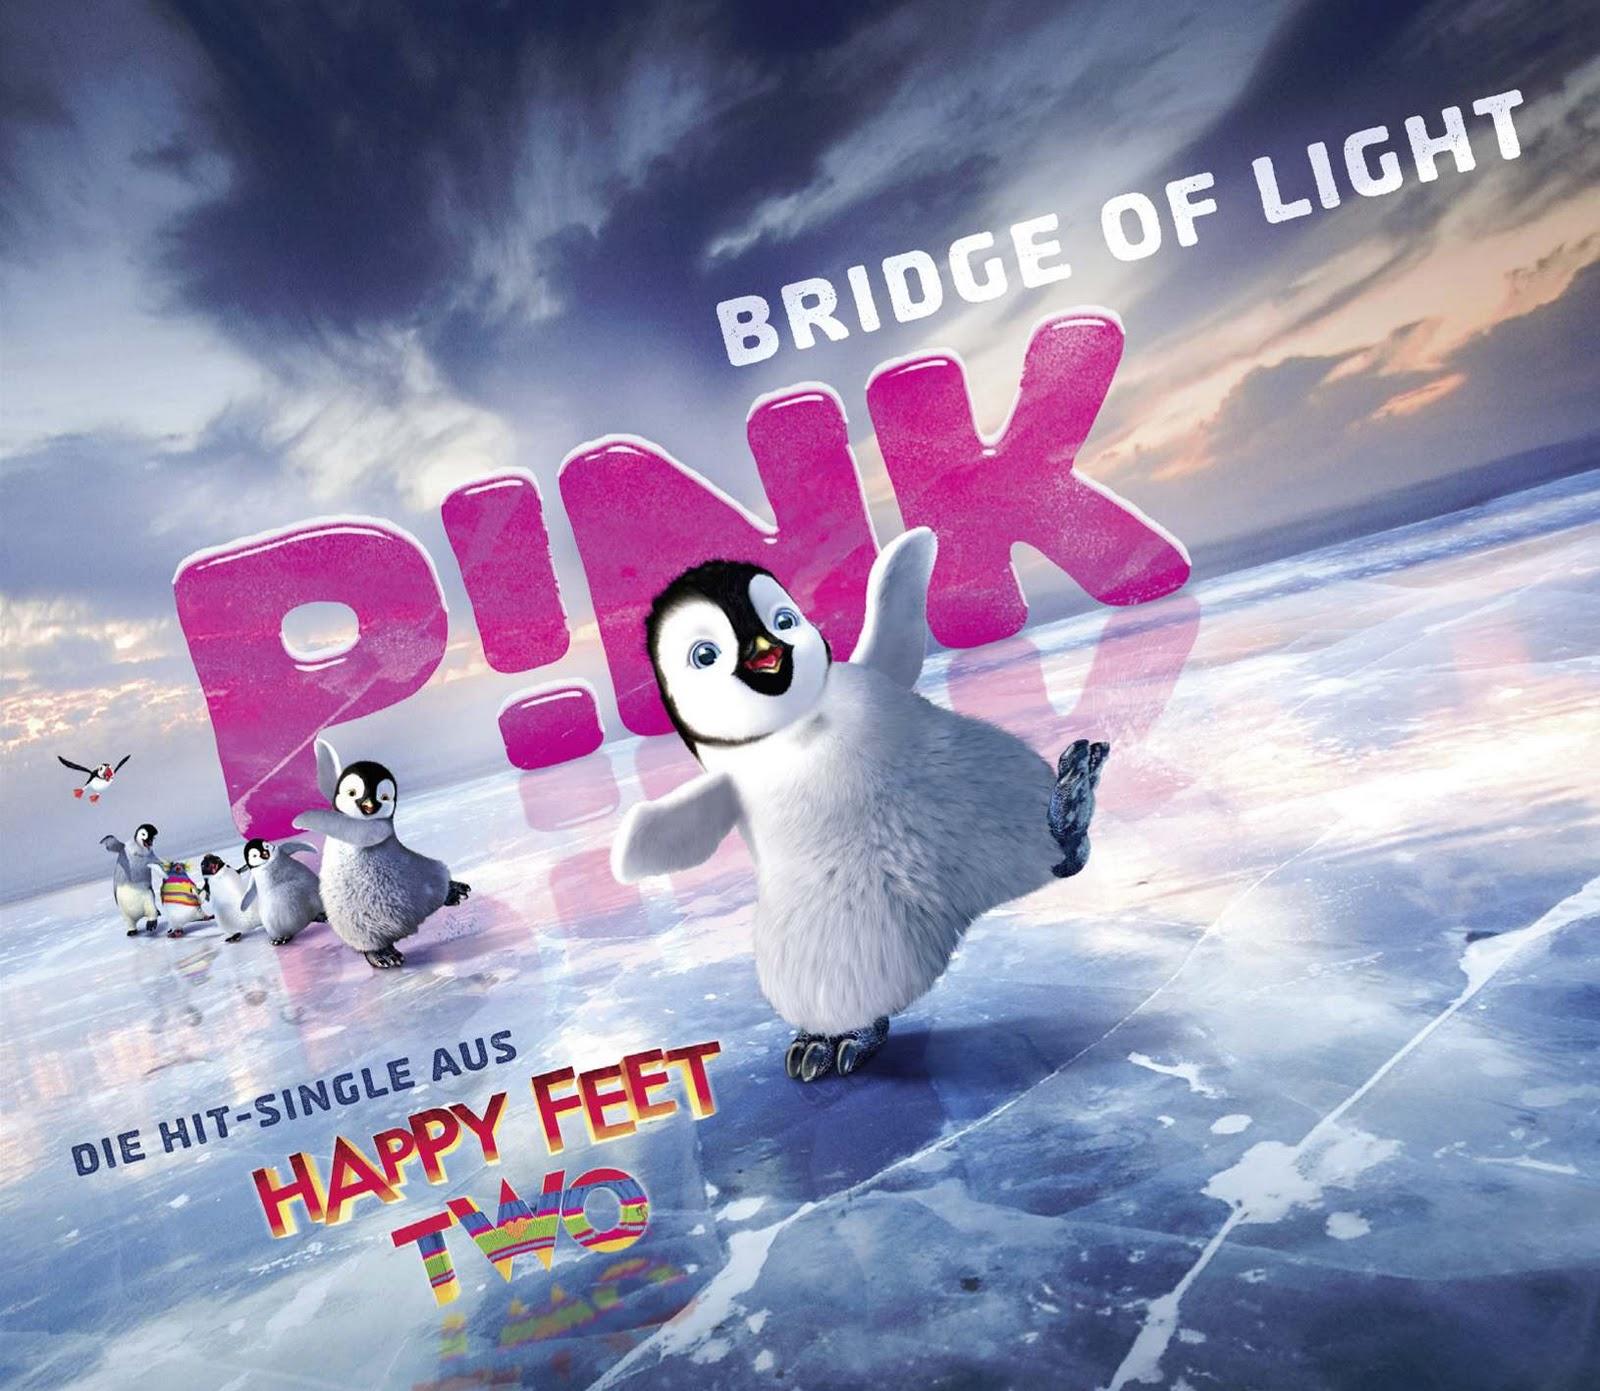 http://1.bp.blogspot.com/-uuiBMmIH380/TvTZNAahz5I/AAAAAAAABNk/t3q49juNq6o/s1600/Pink-BridgeOfLight_cover.jpg